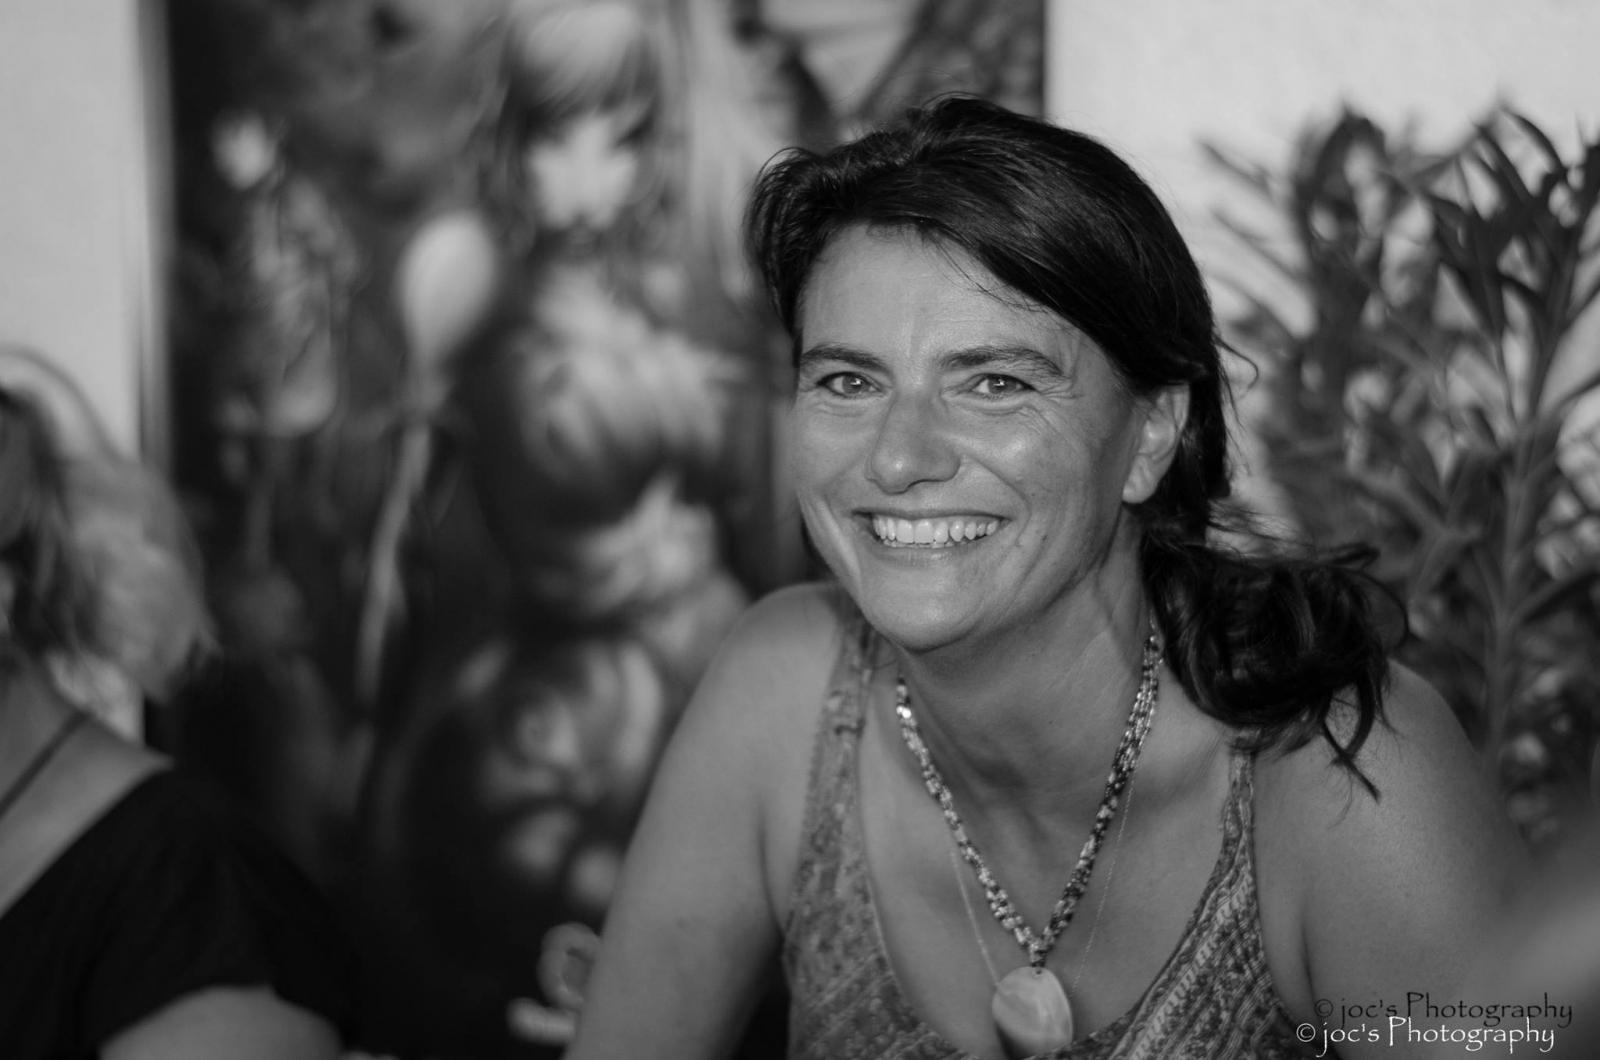 Nathalie Desperches Boukhatem